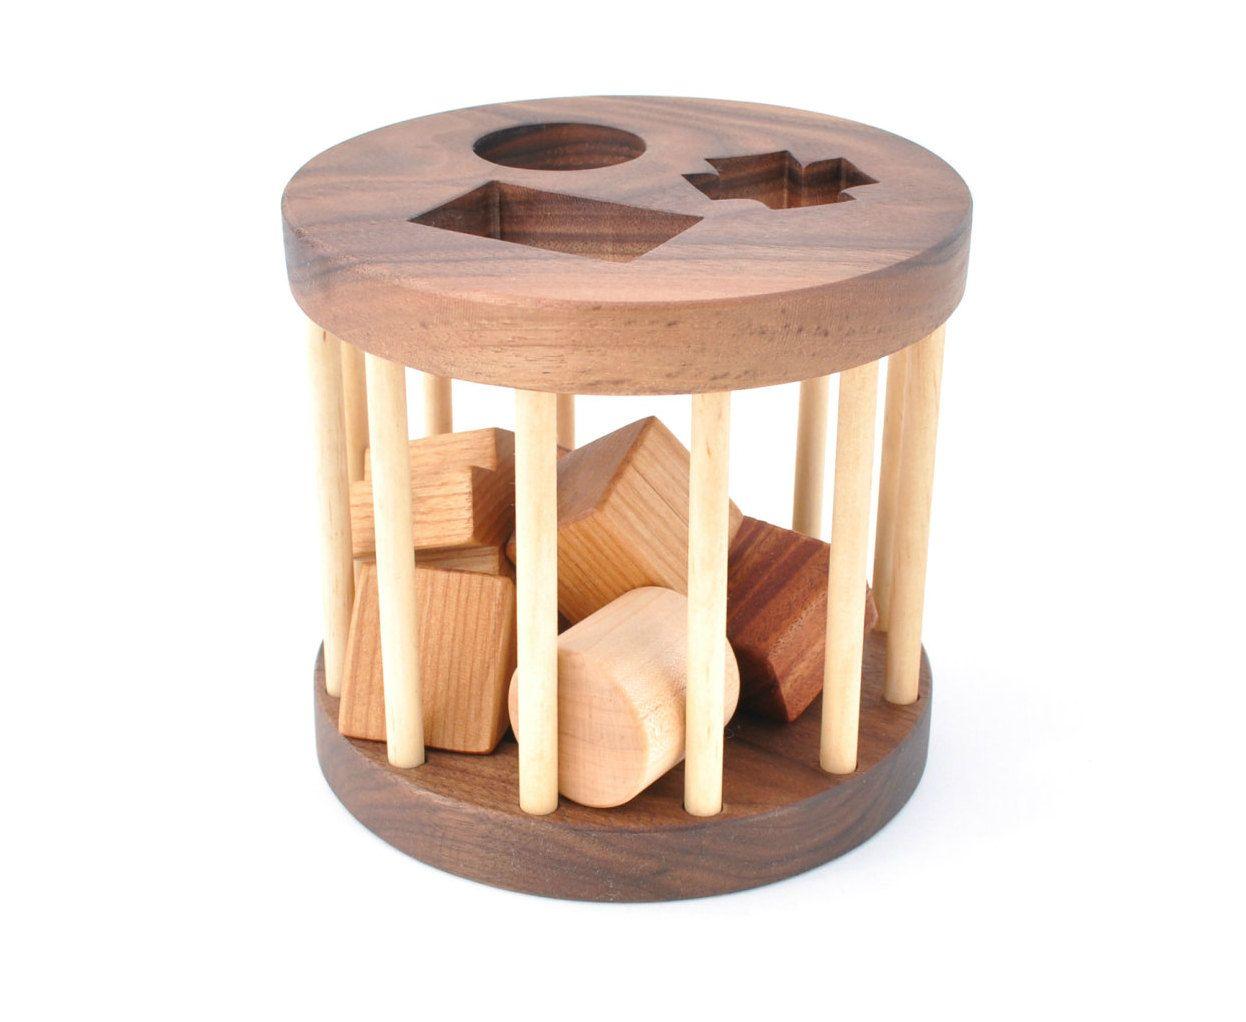 Wooden Shape Sorter Toy - Montessori Inspired Educational ...